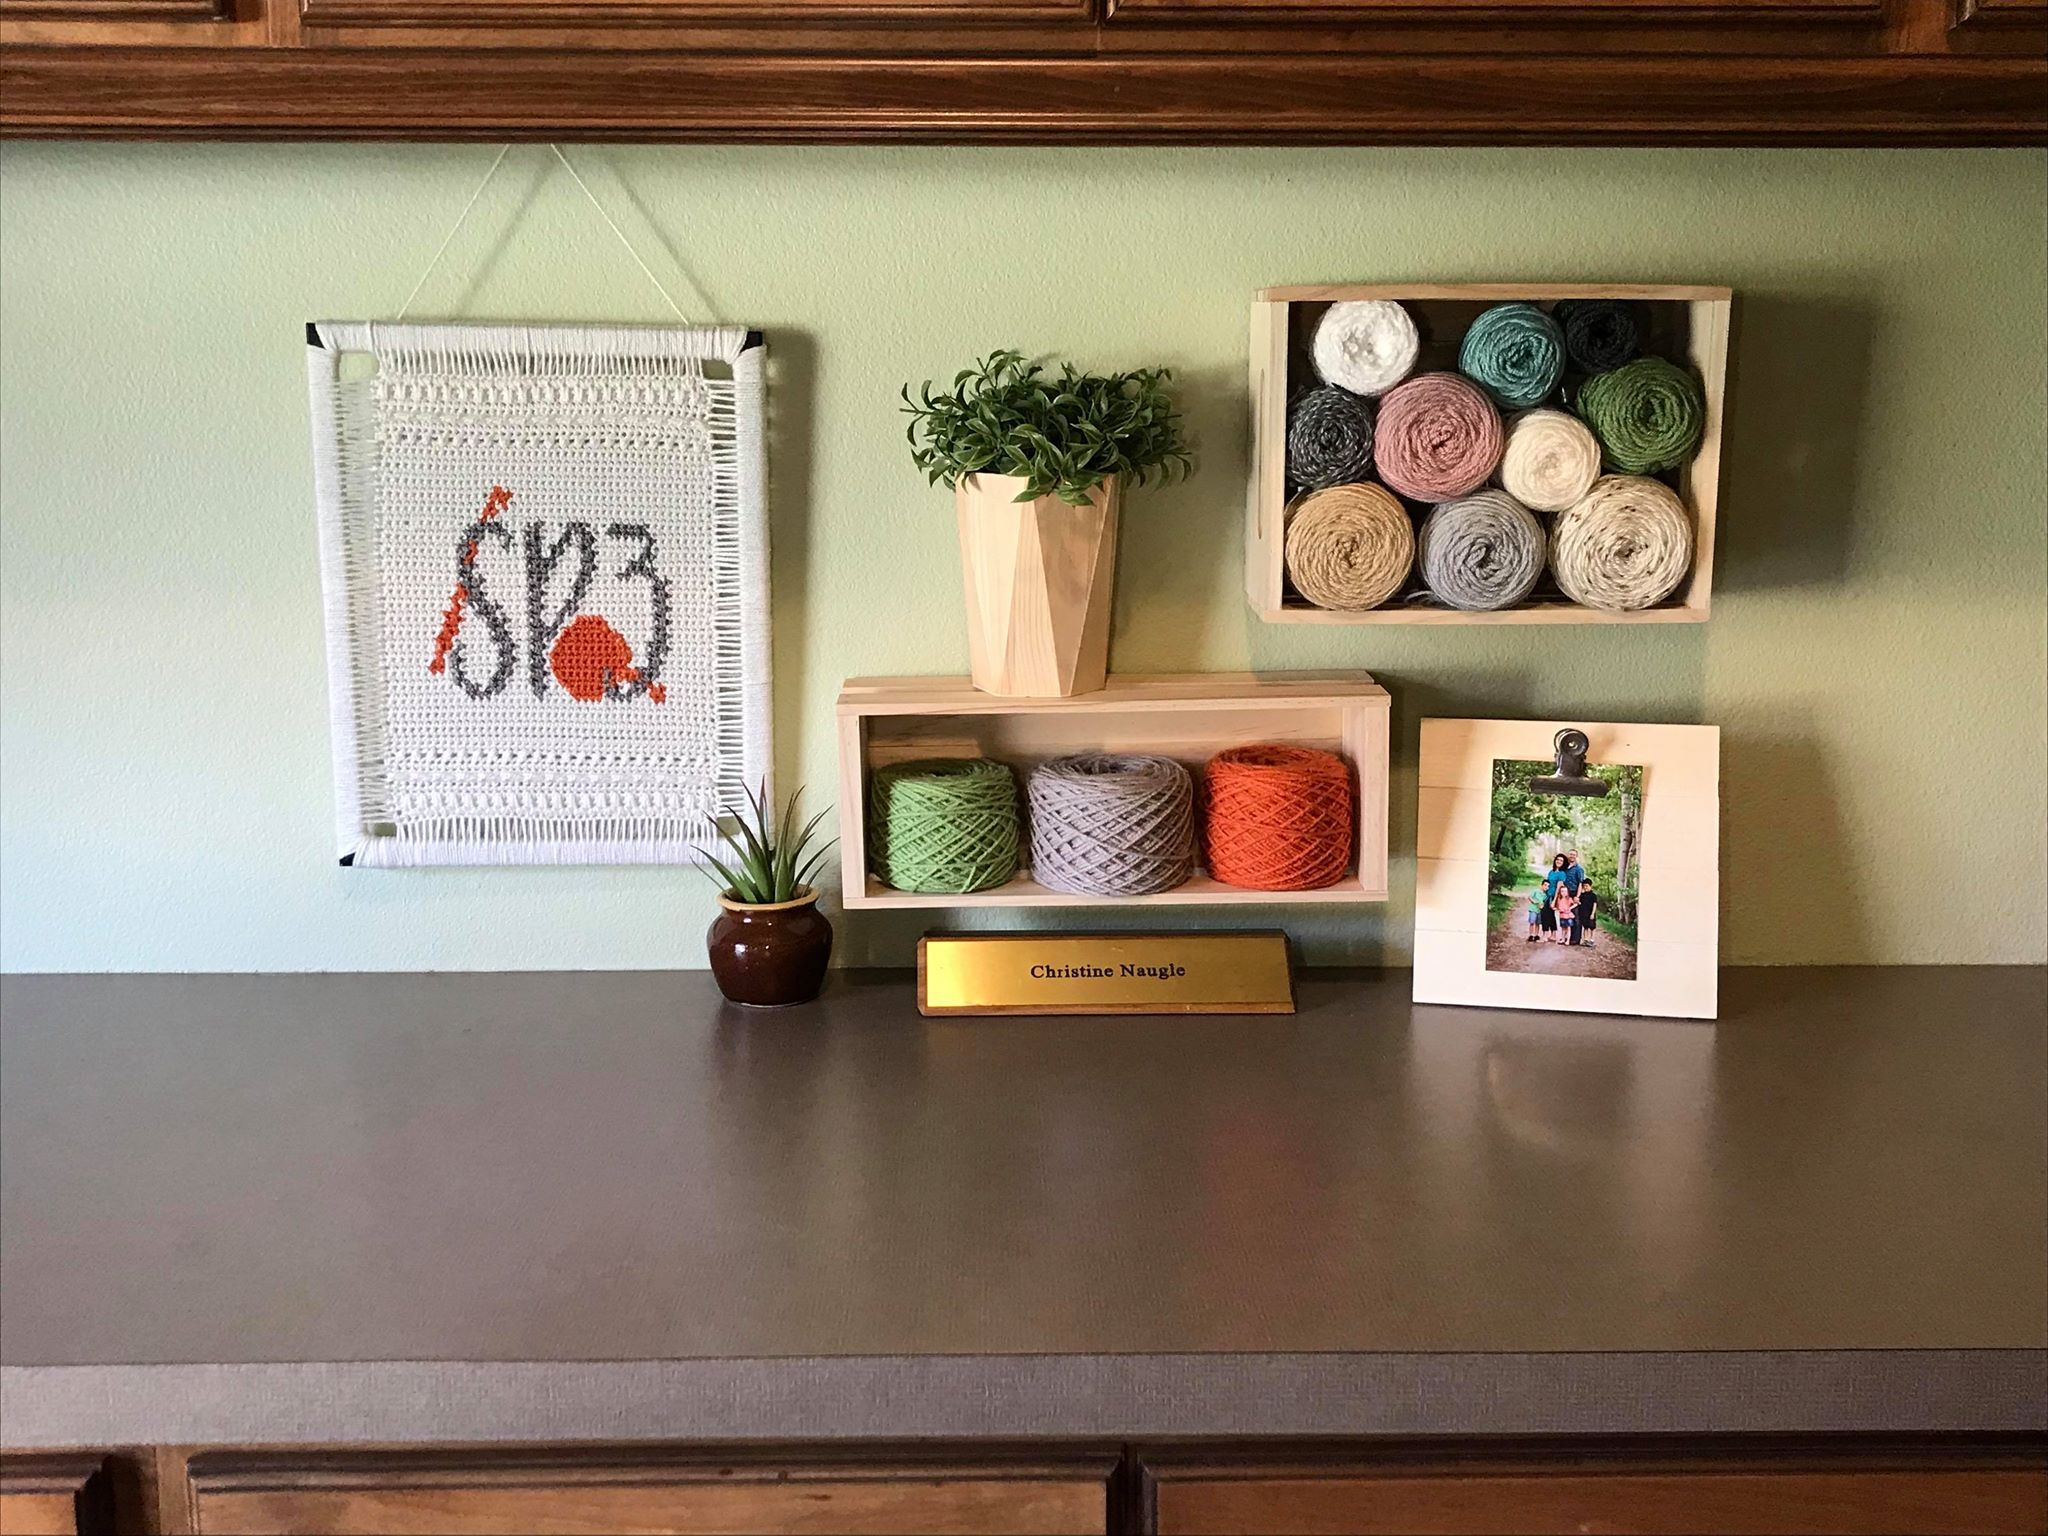 Sweet Potato 3's Home Office Display